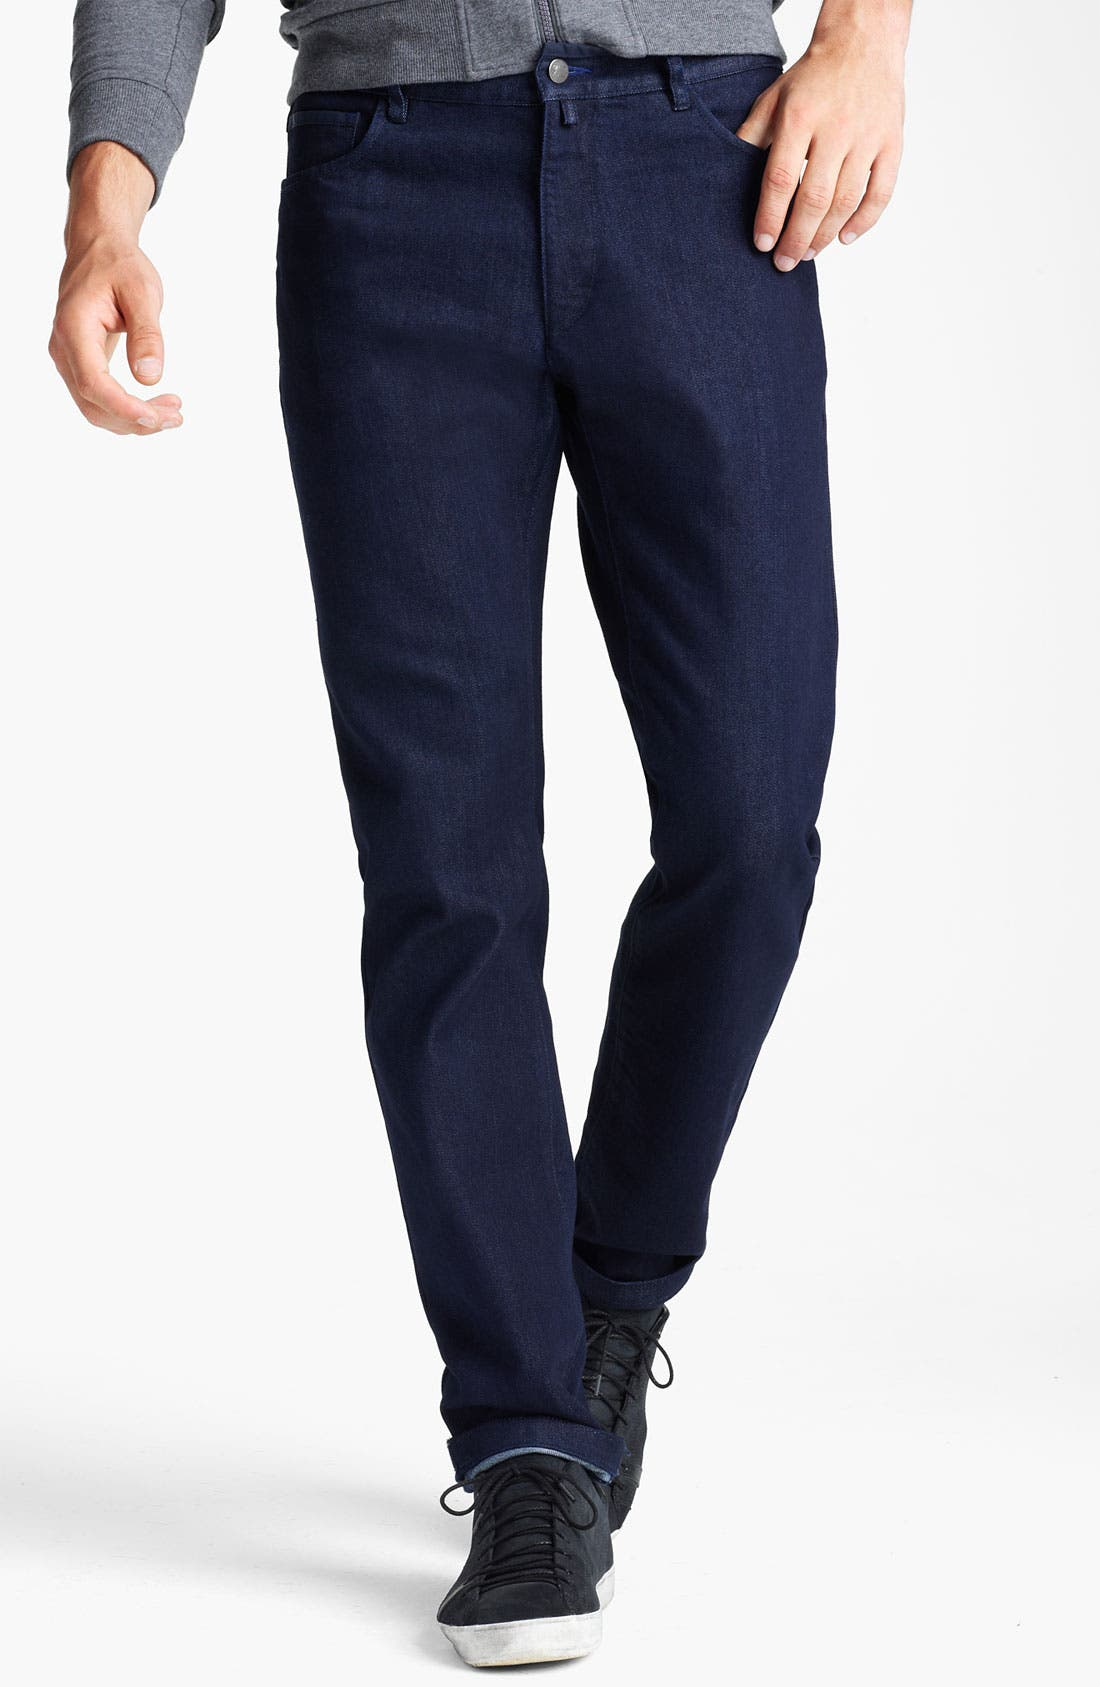 Main Image - Zegna Sport 'Cool Max' Straight Leg Jeans (Dark Blue)